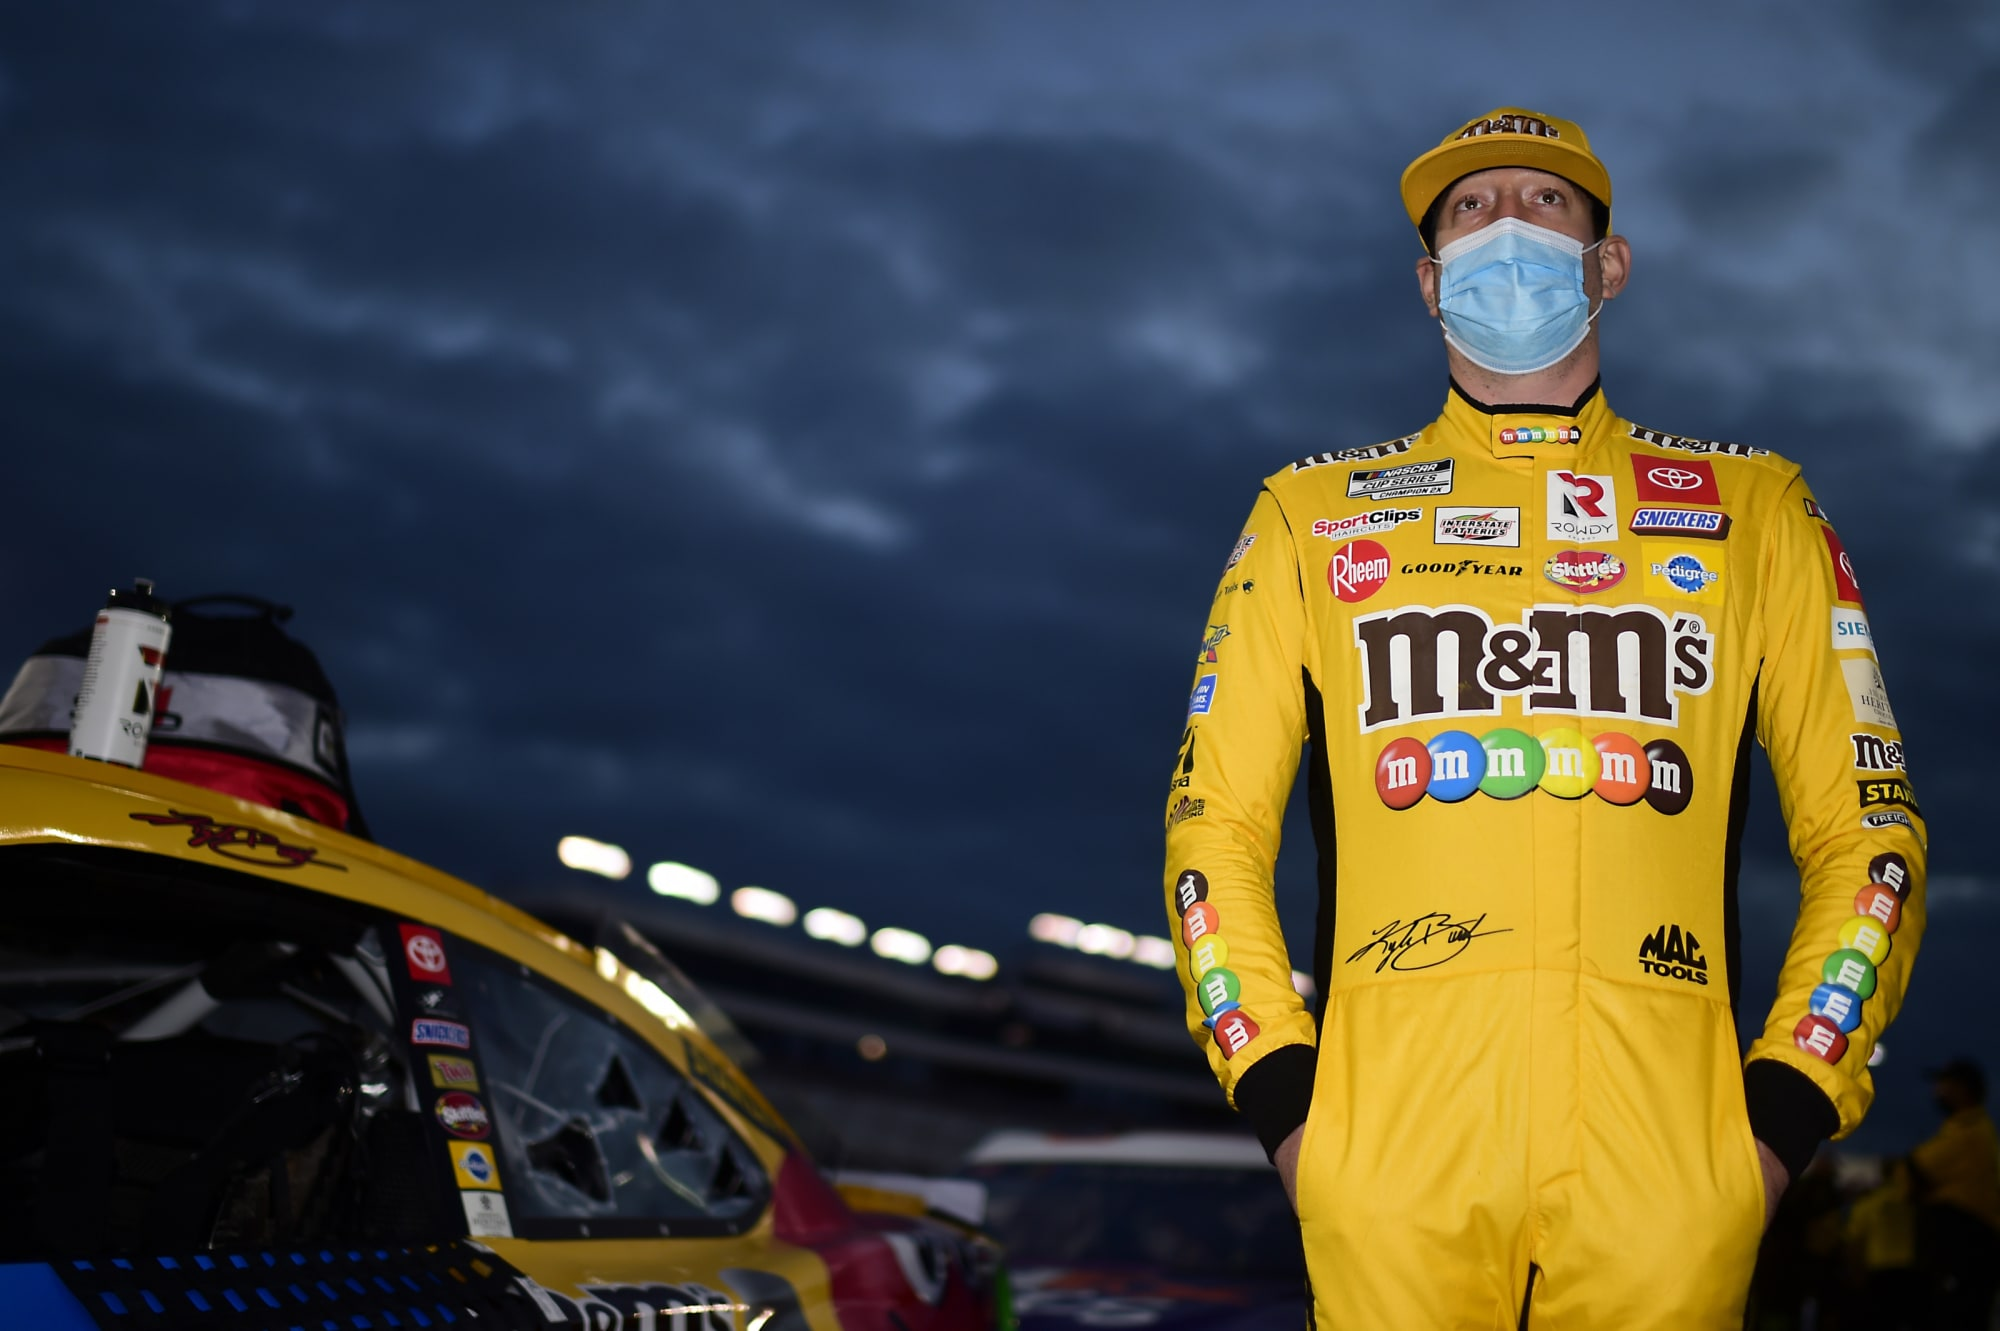 NASCAR: Kyle Busch was absolutely correct